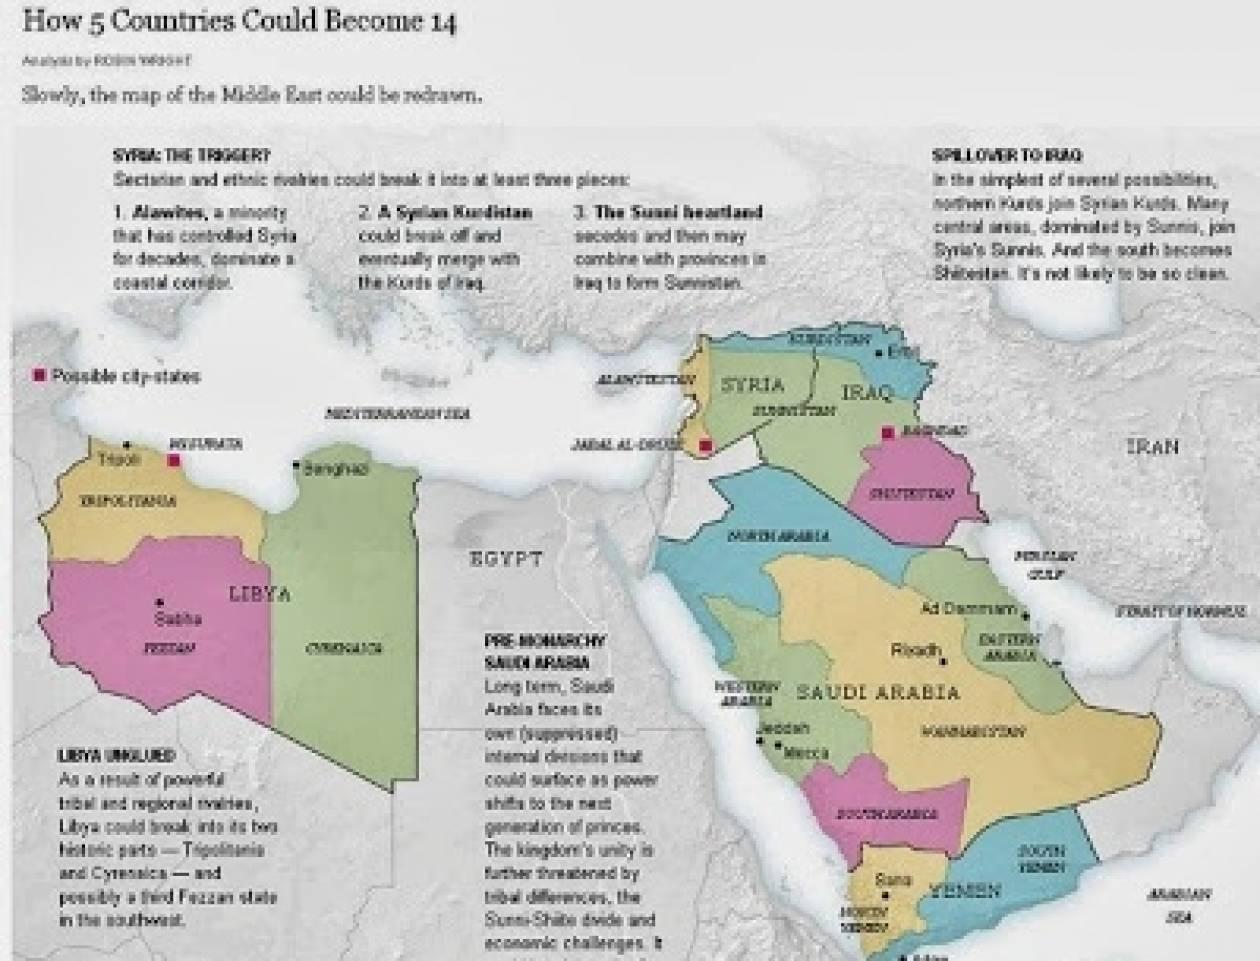 NY Times: Πως 5 χώρες της Μέσης Ανατολής θα γίνουν 14